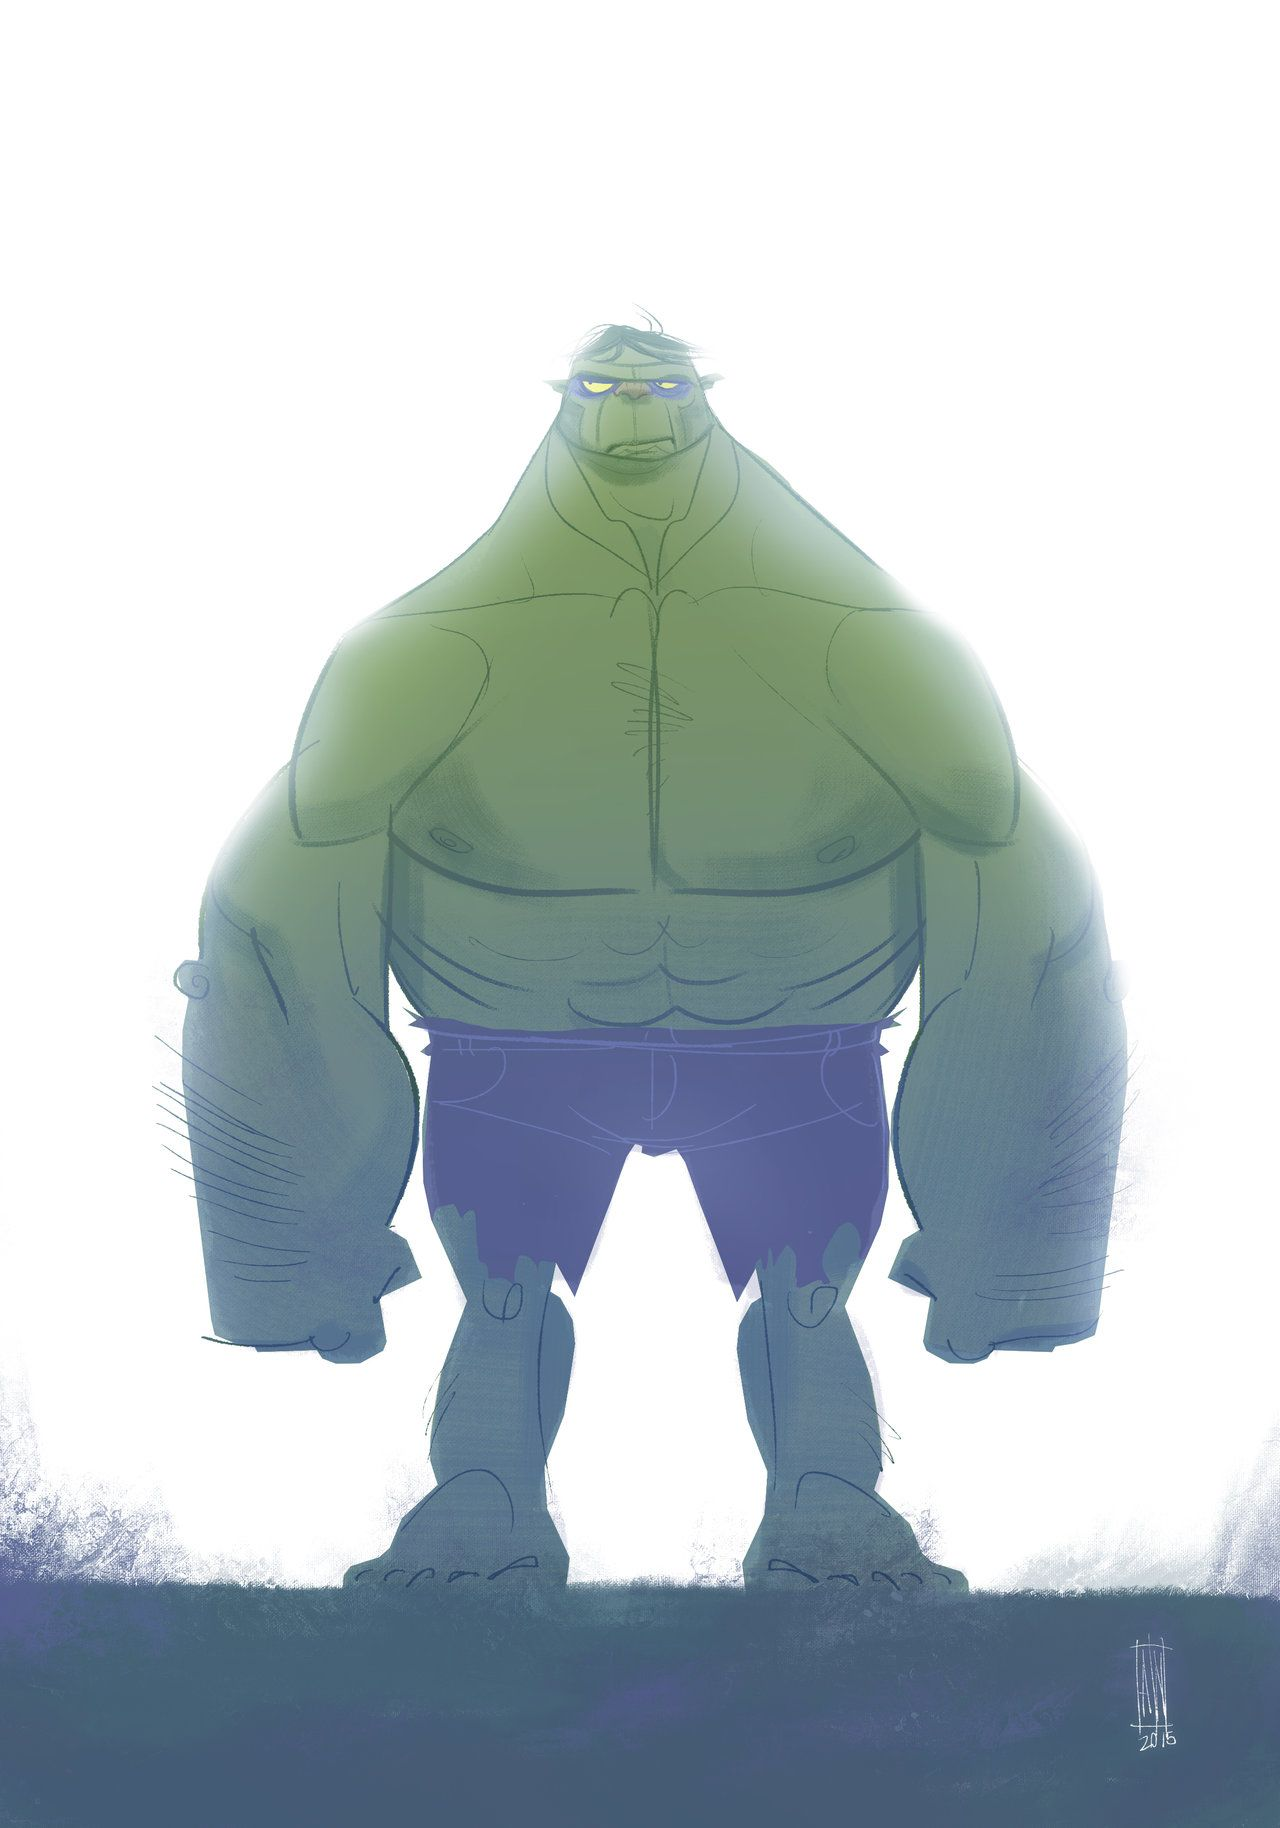 #Hulk #Animated #Fan #Art. (Hulk) By: Andersonnascimento. (THE * 3 * STÅR * ÅWARD OF: AW YEAH, IT'S MAJOR ÅWESOMENESS!!!™)[THANK Ü 4 PINNING!!!<·><]<©>ÅÅÅ+(OB4E)   https://s-media-cache-ak0.pinimg.com/564x/f1/4f/ea/f14fea74ca3cb0f02c08e2a8a21b2251.jpg